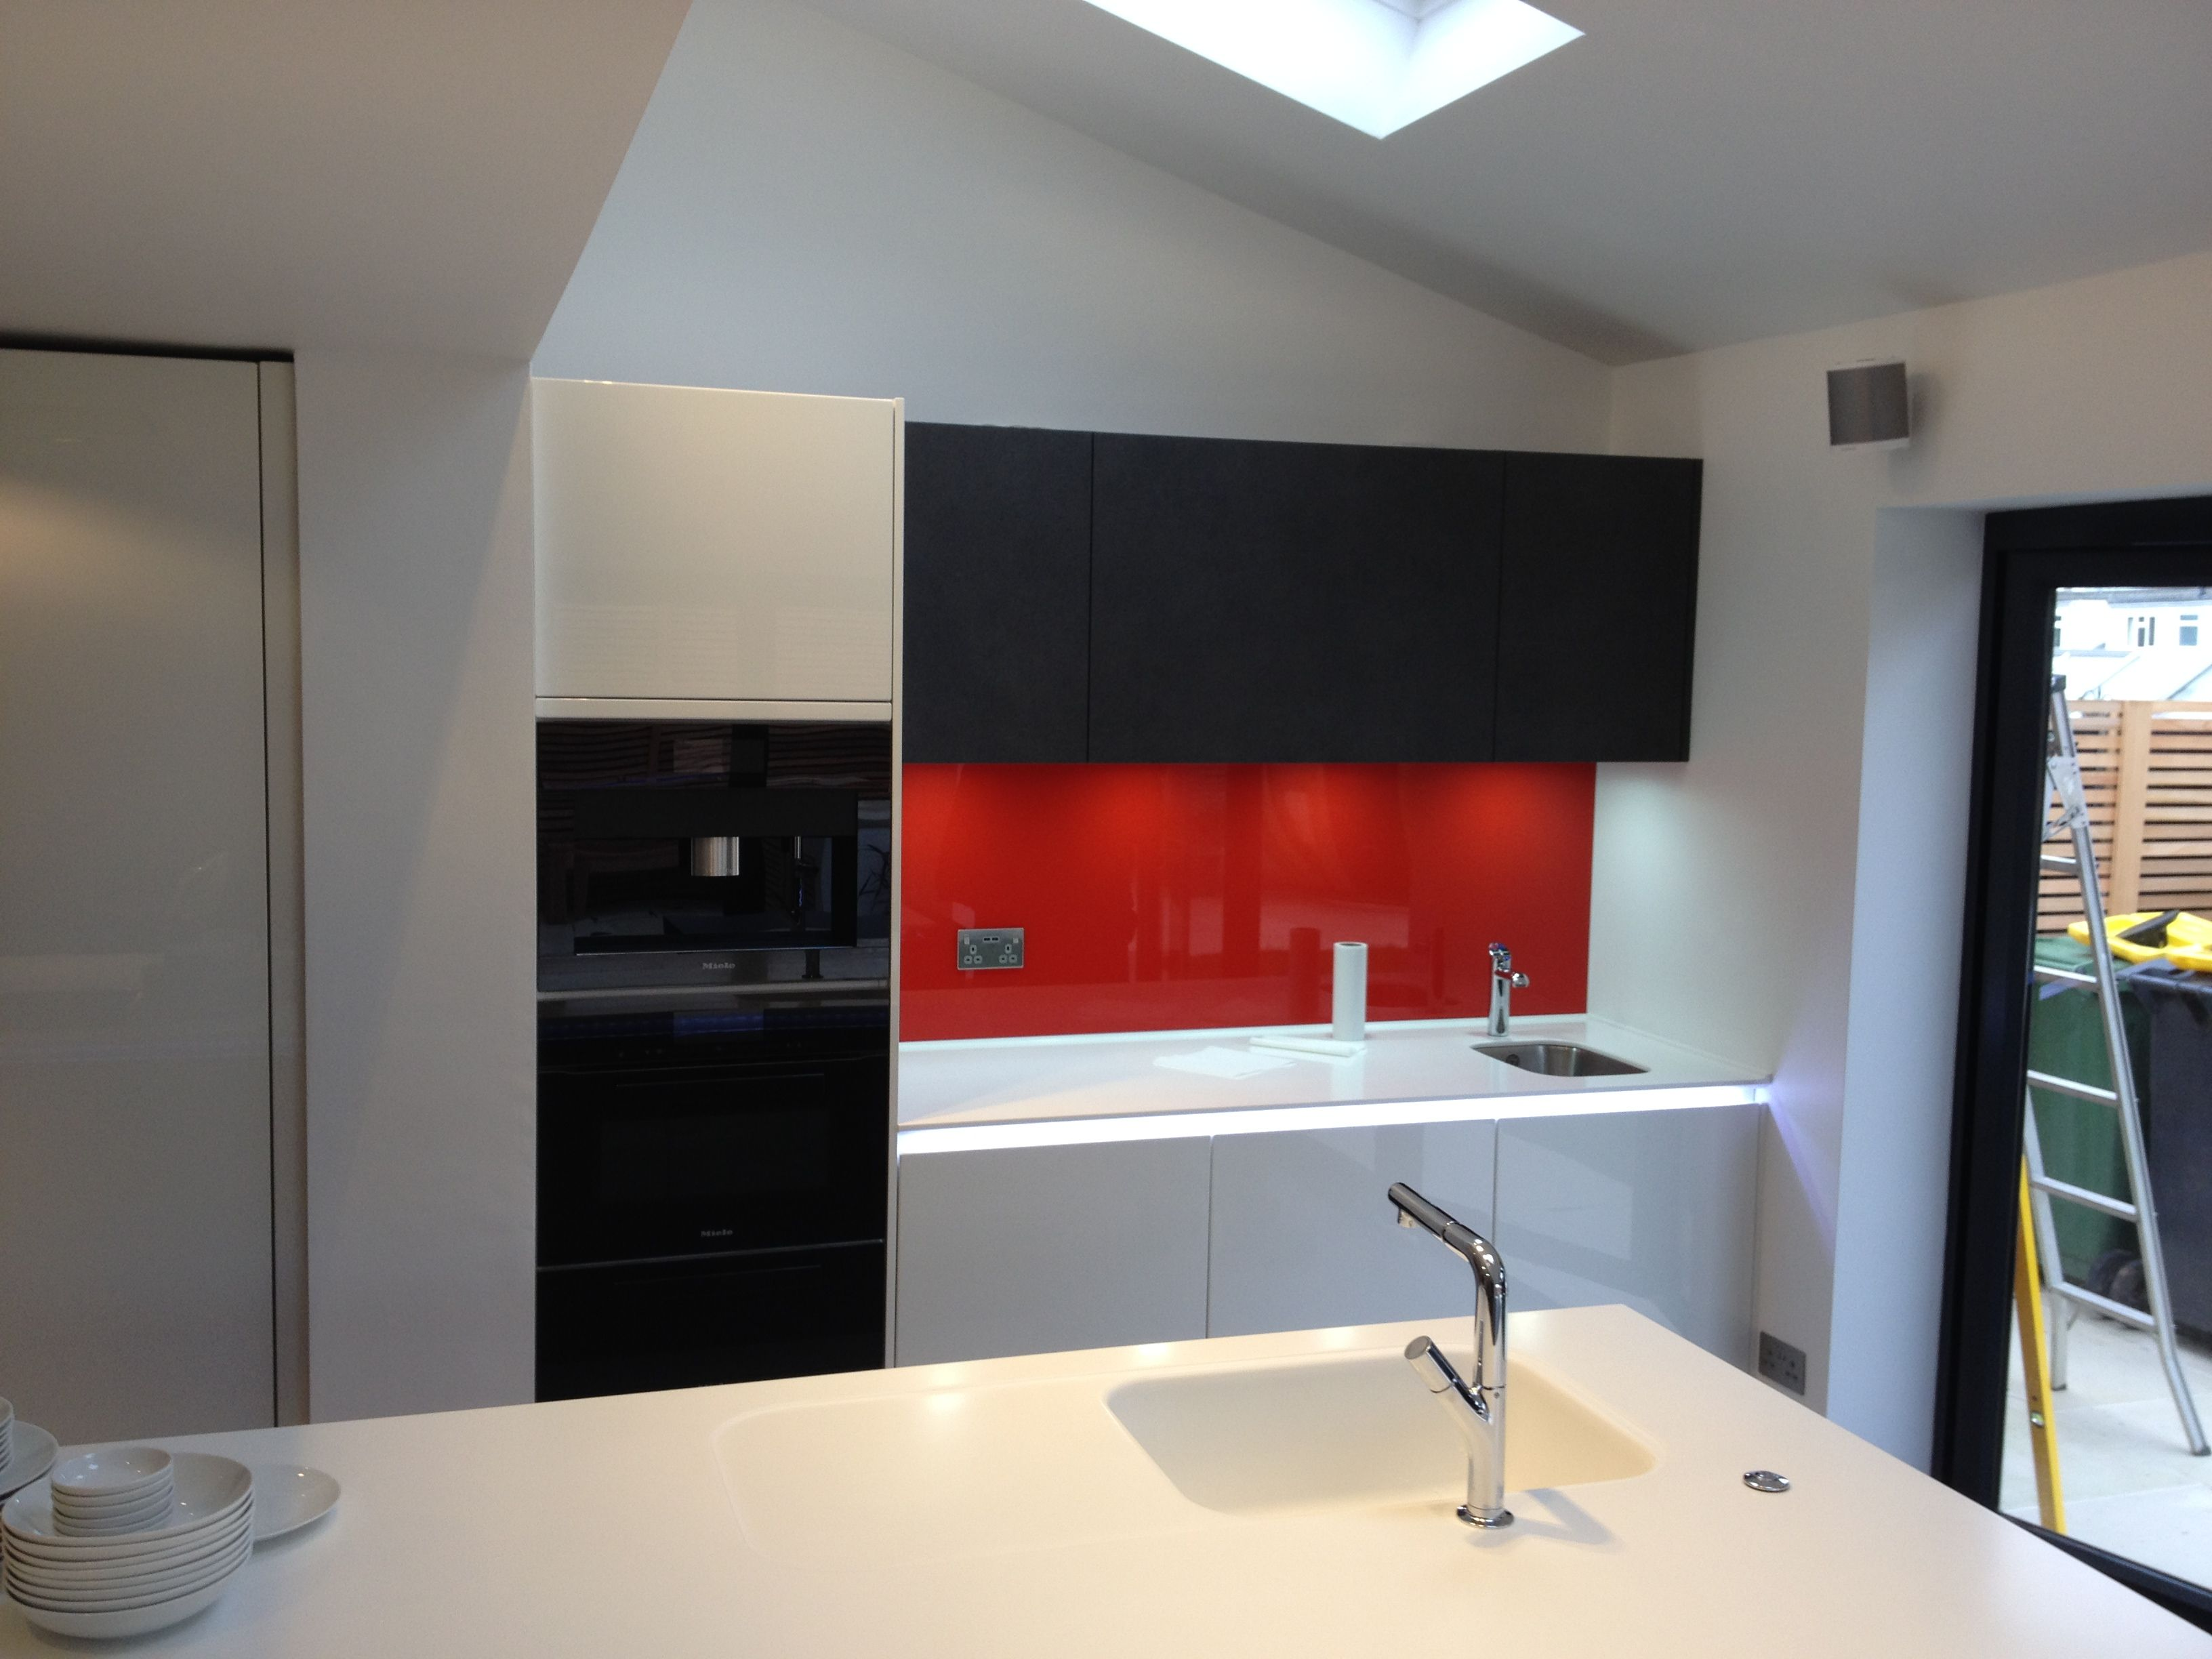 Red Glass Splashback On Alno Kitchen With Corian Worktops Miele Appliances By Phil Harflett With Images Stylish Kitchen Glass Splashback Alno Kitchen